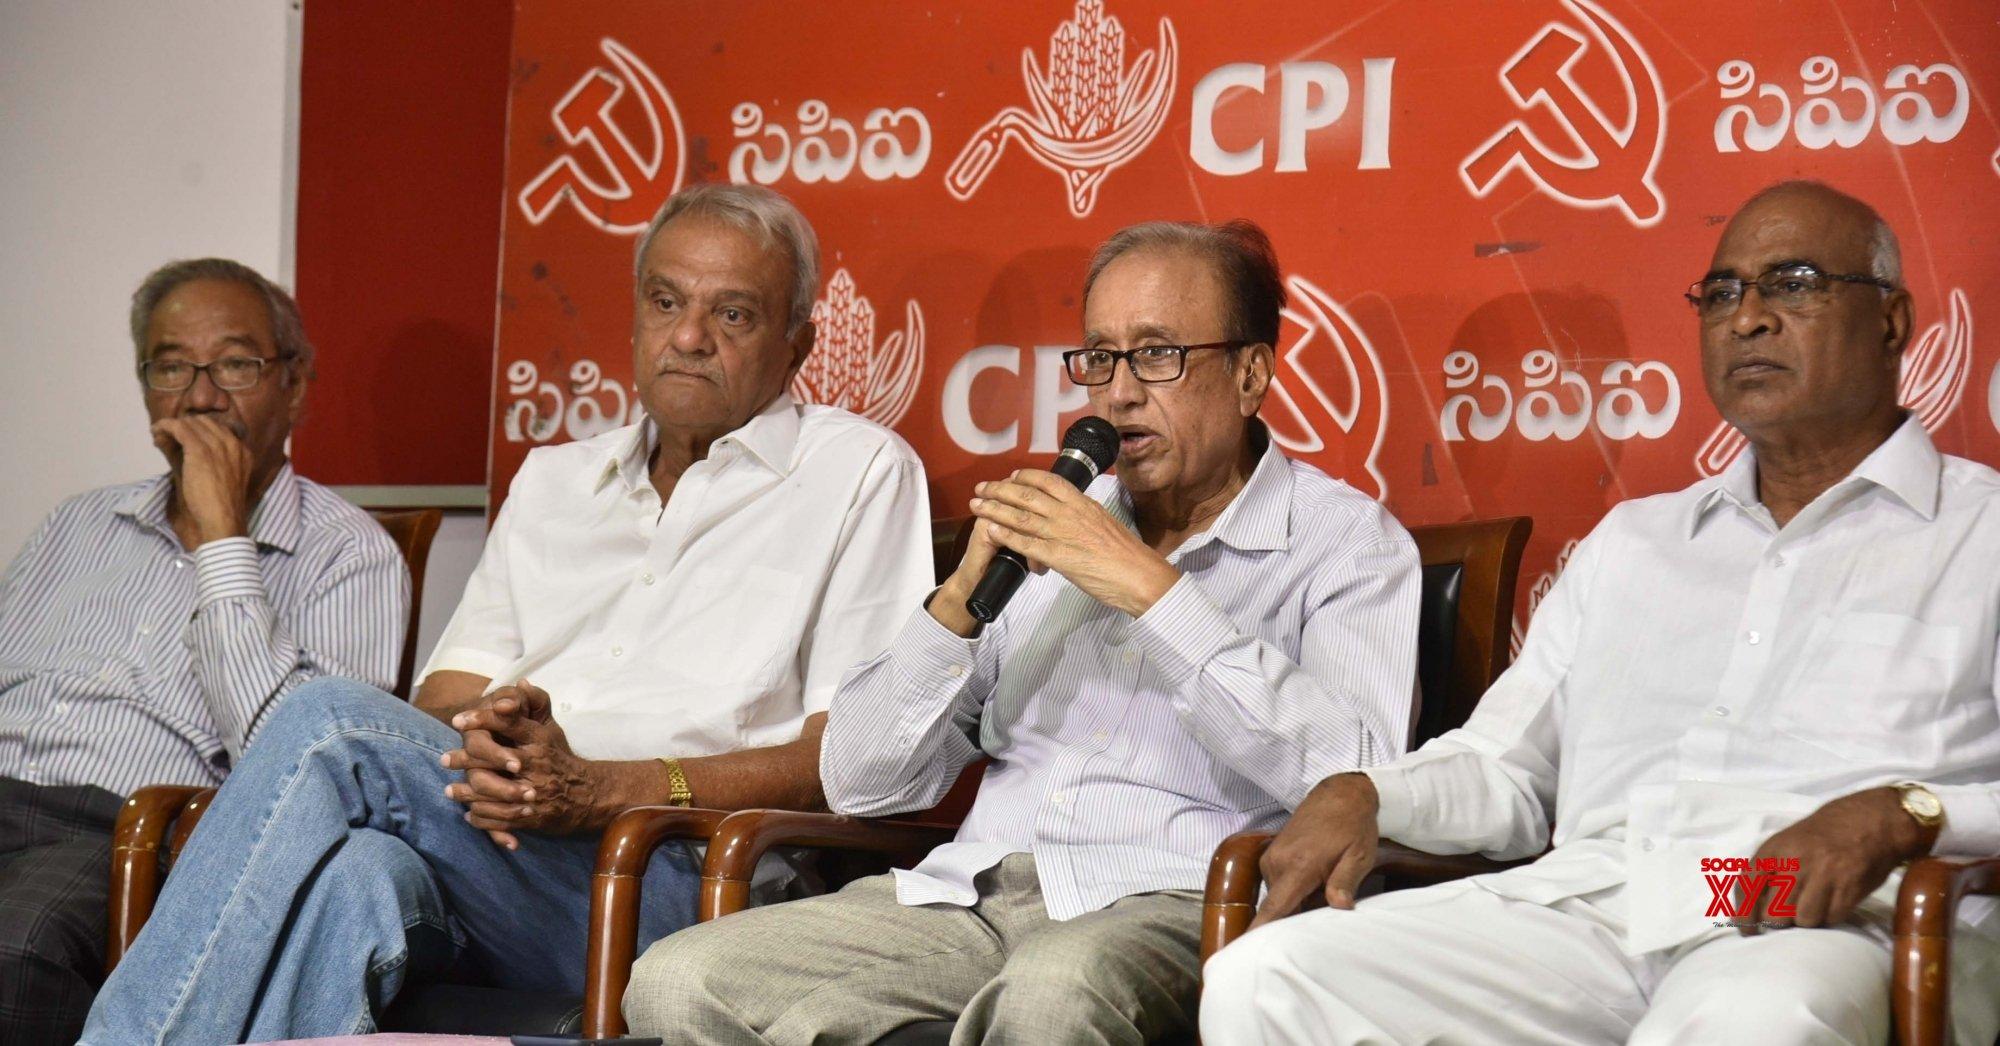 Hyderabad: CPI - M press conference #Gallery